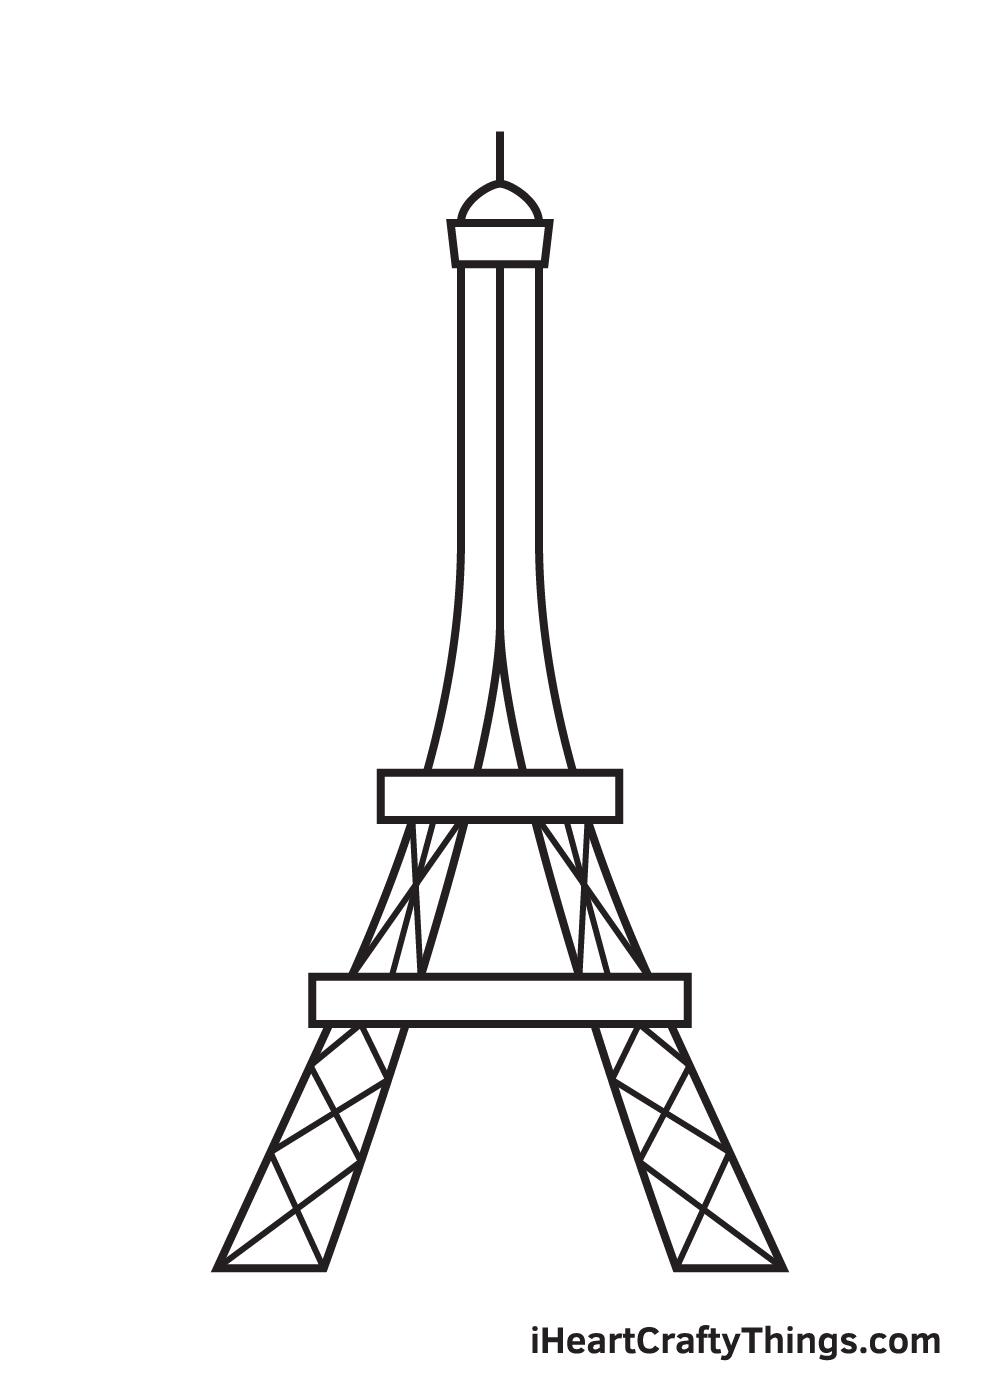 Eiffel Tower drawing - step 7